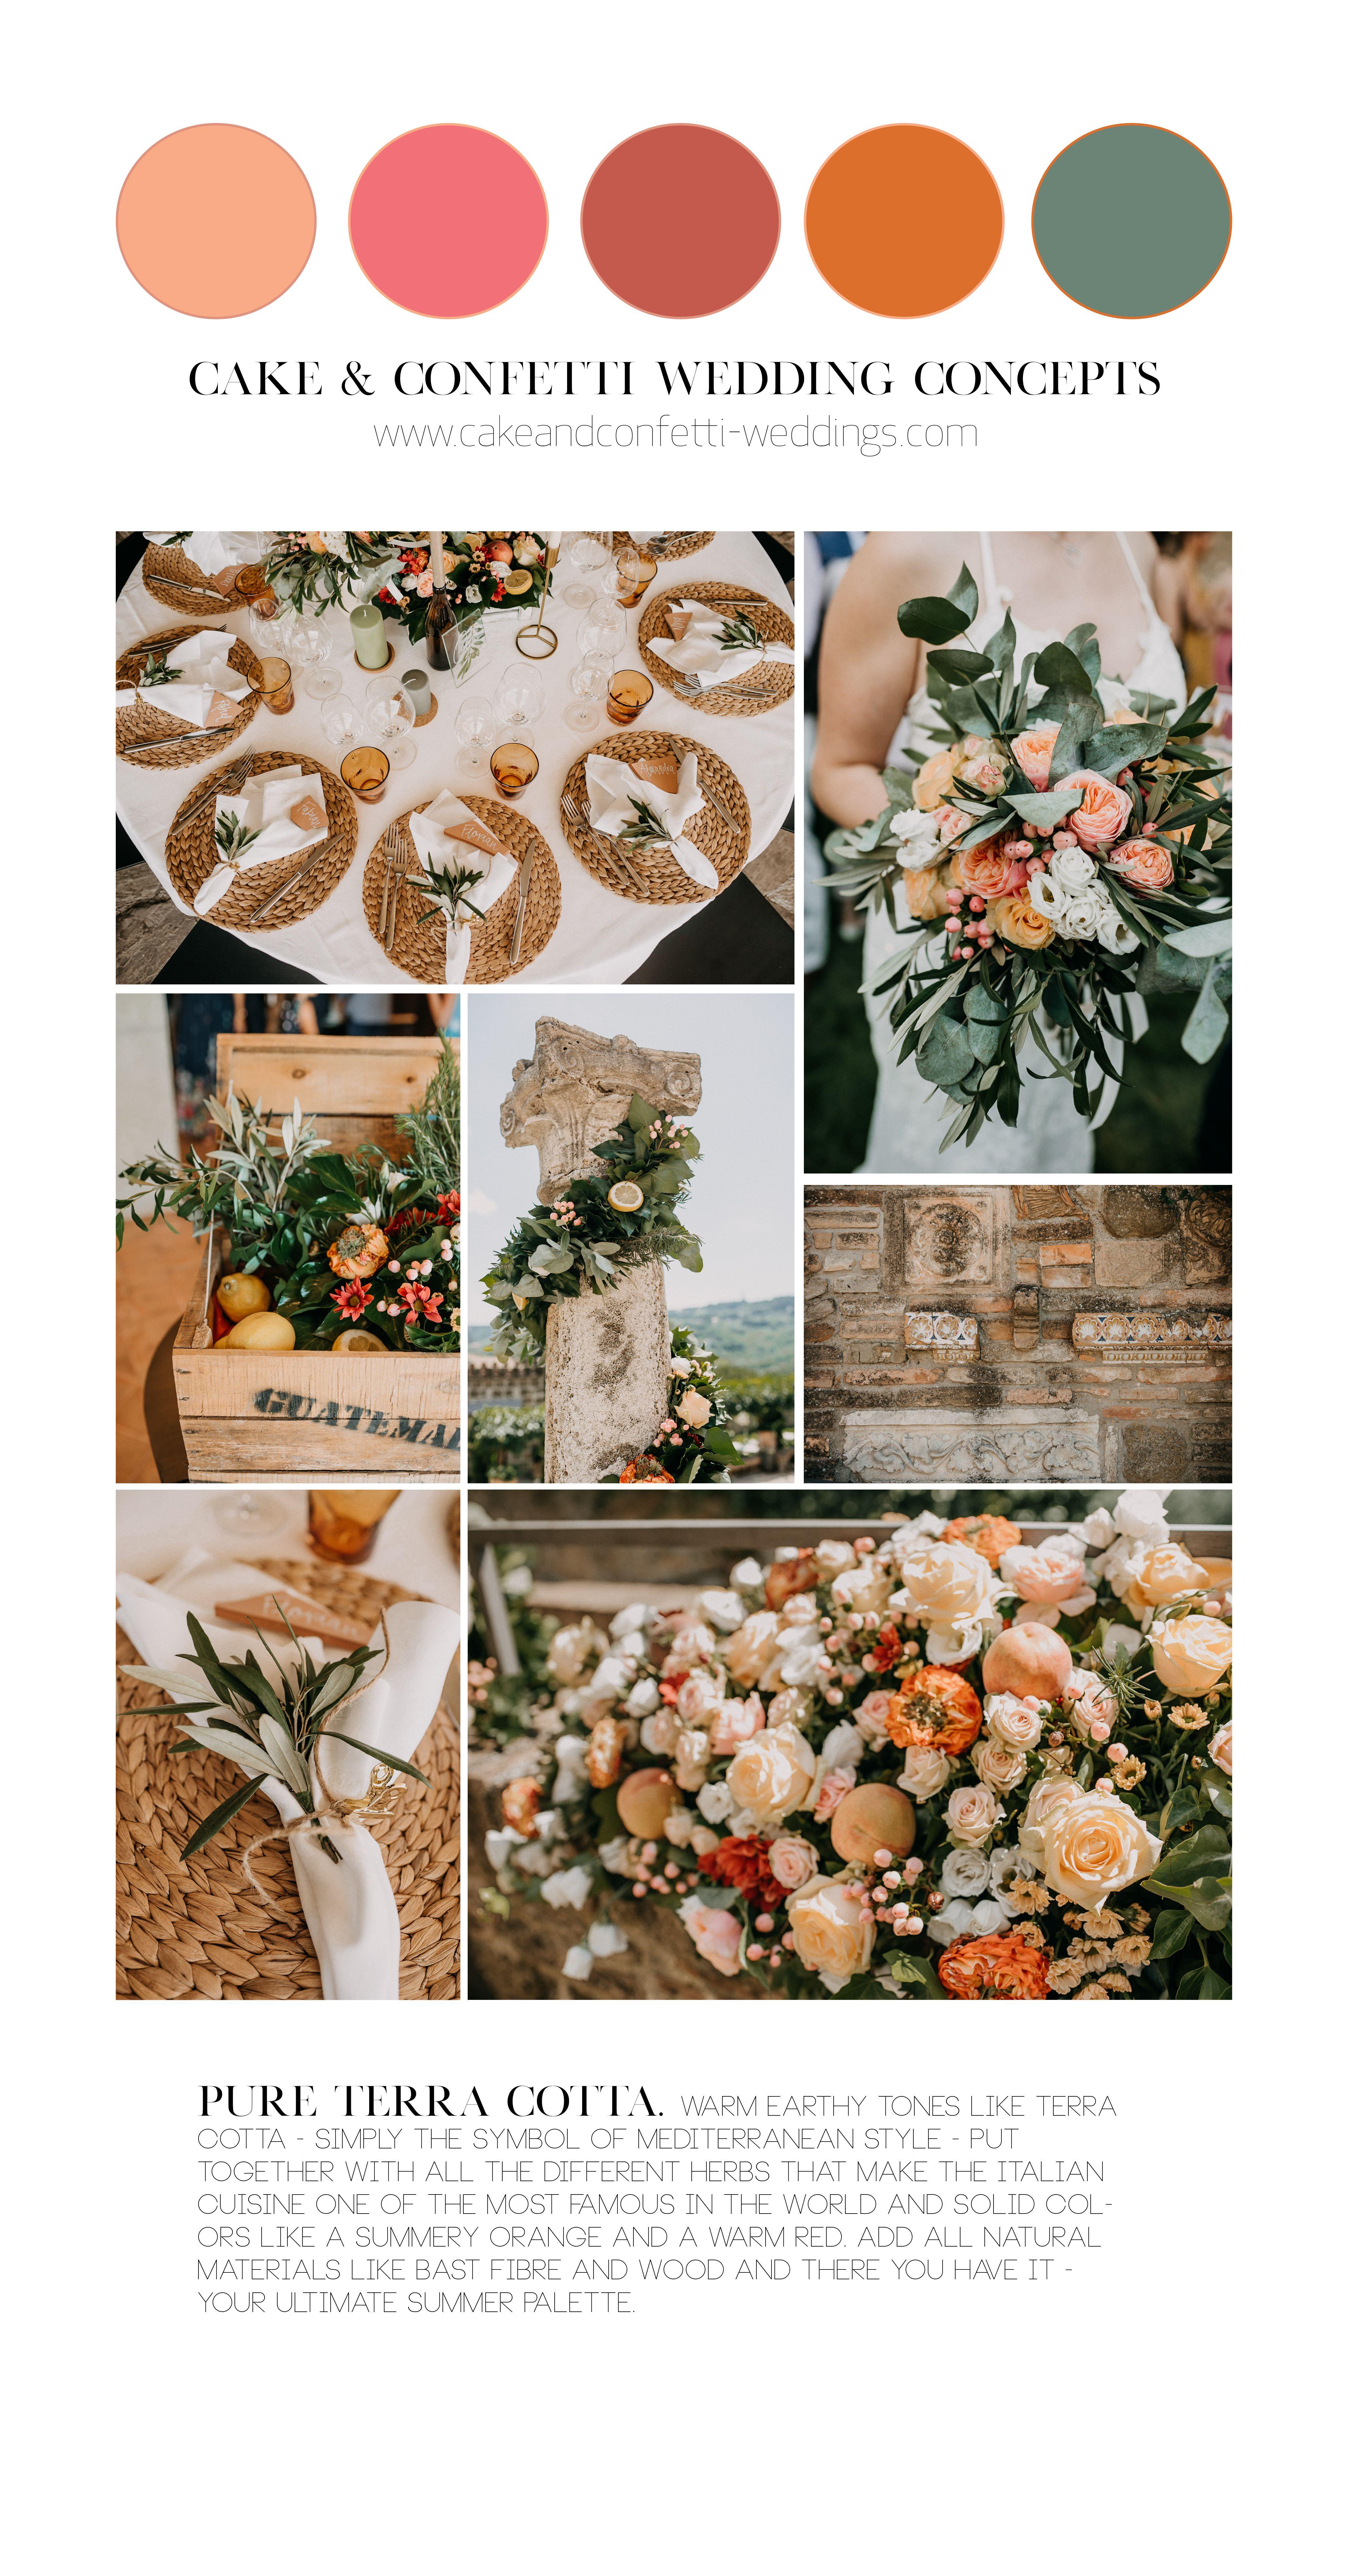 Pure Terra Cotta Wedding Color Palette Wedding Color Palette Orange Wedding Colors Earth Tone Wedding